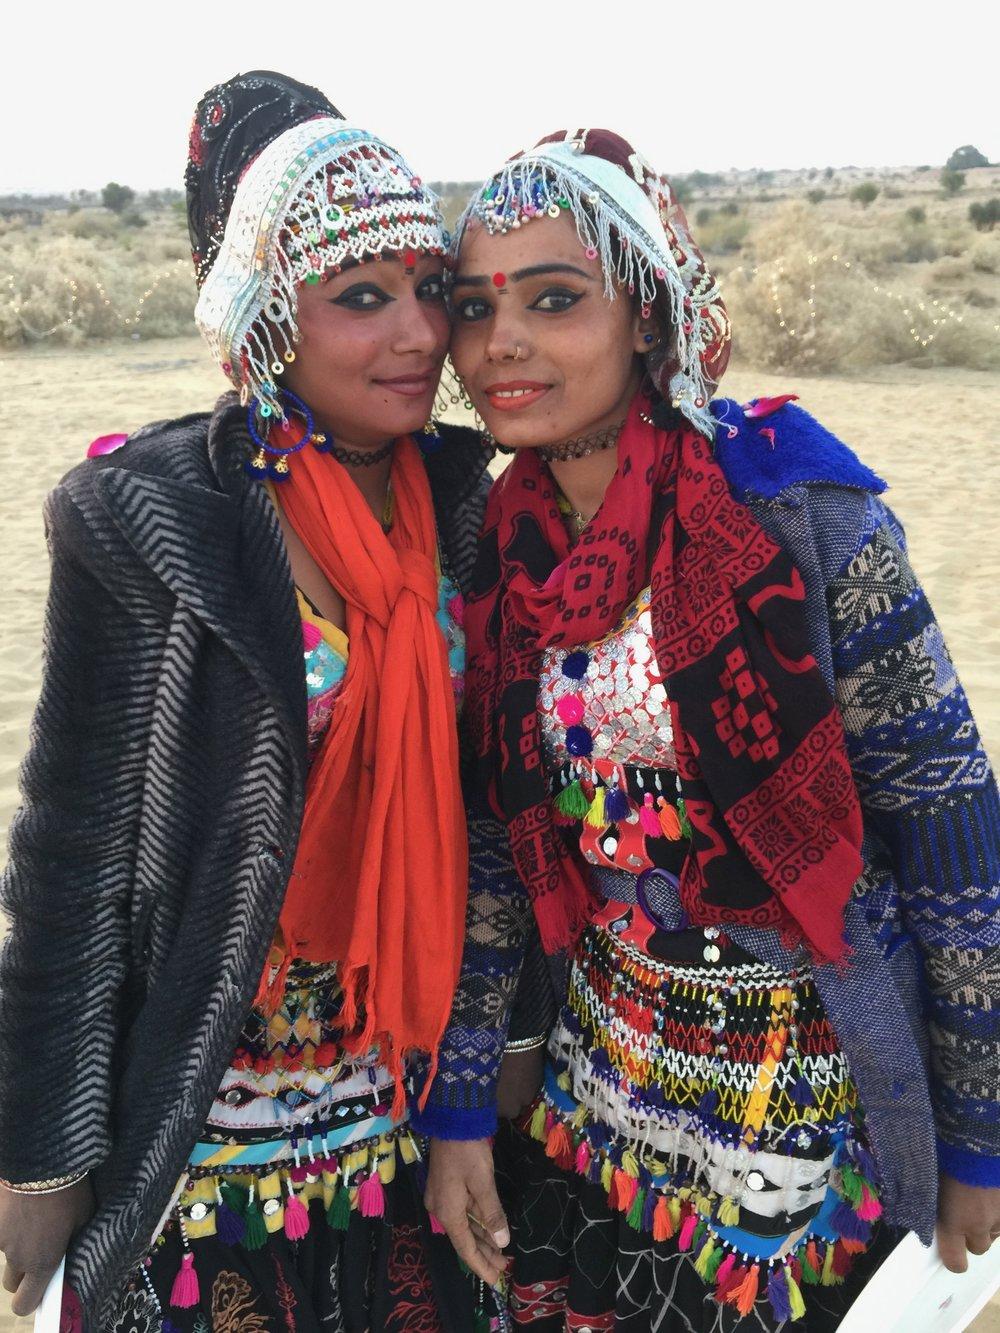 Bikaner tribal costume